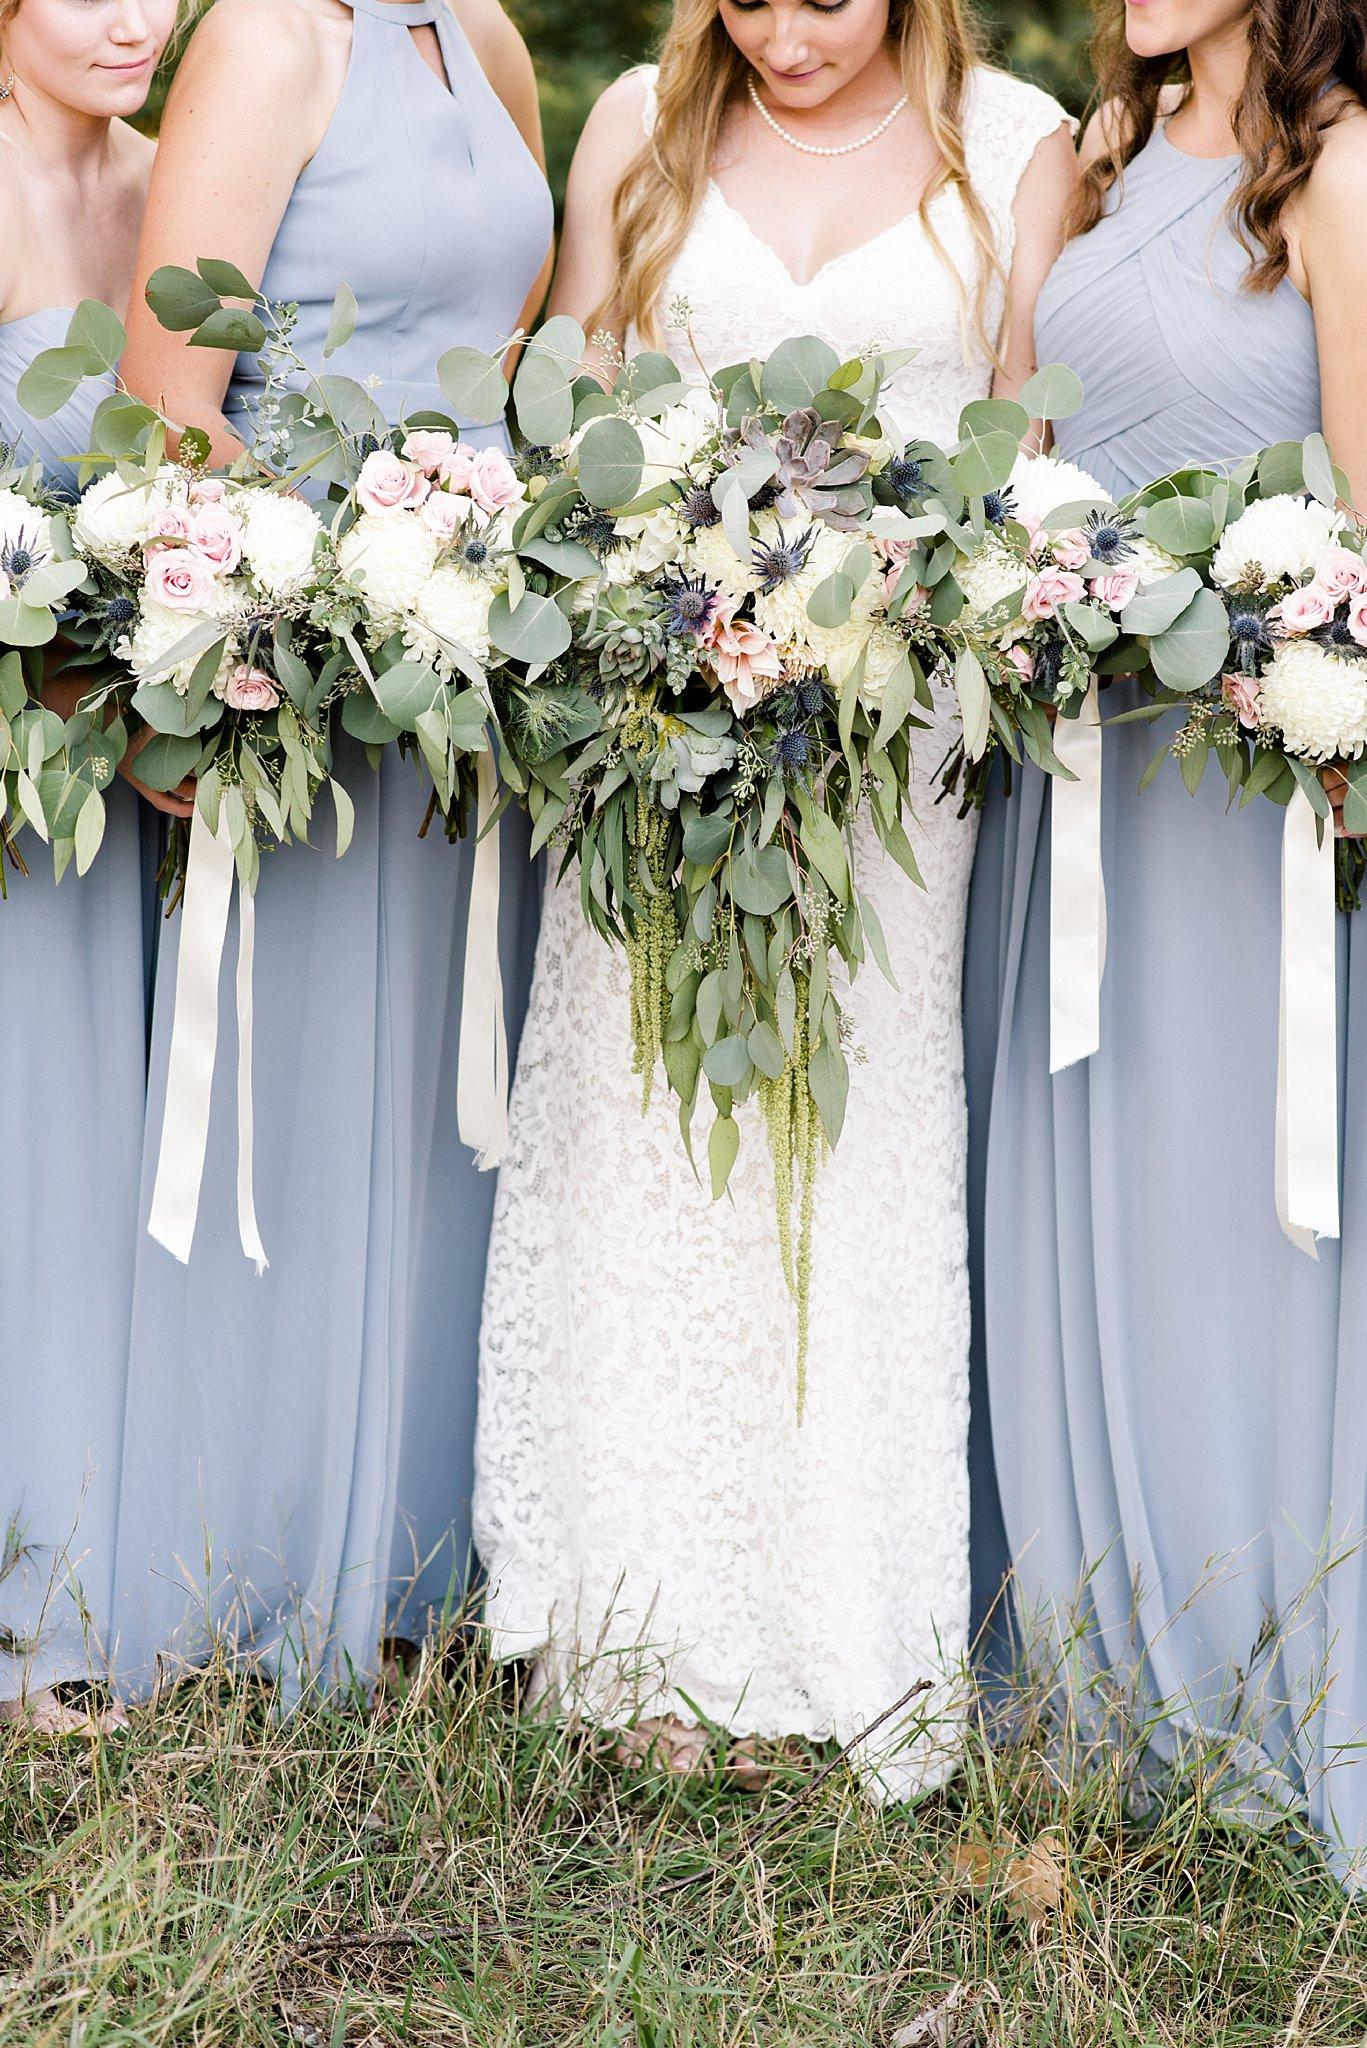 Cadillac-Michigan-wedding-caberfae-peaks-milwaukee-photographer_0051.jpg